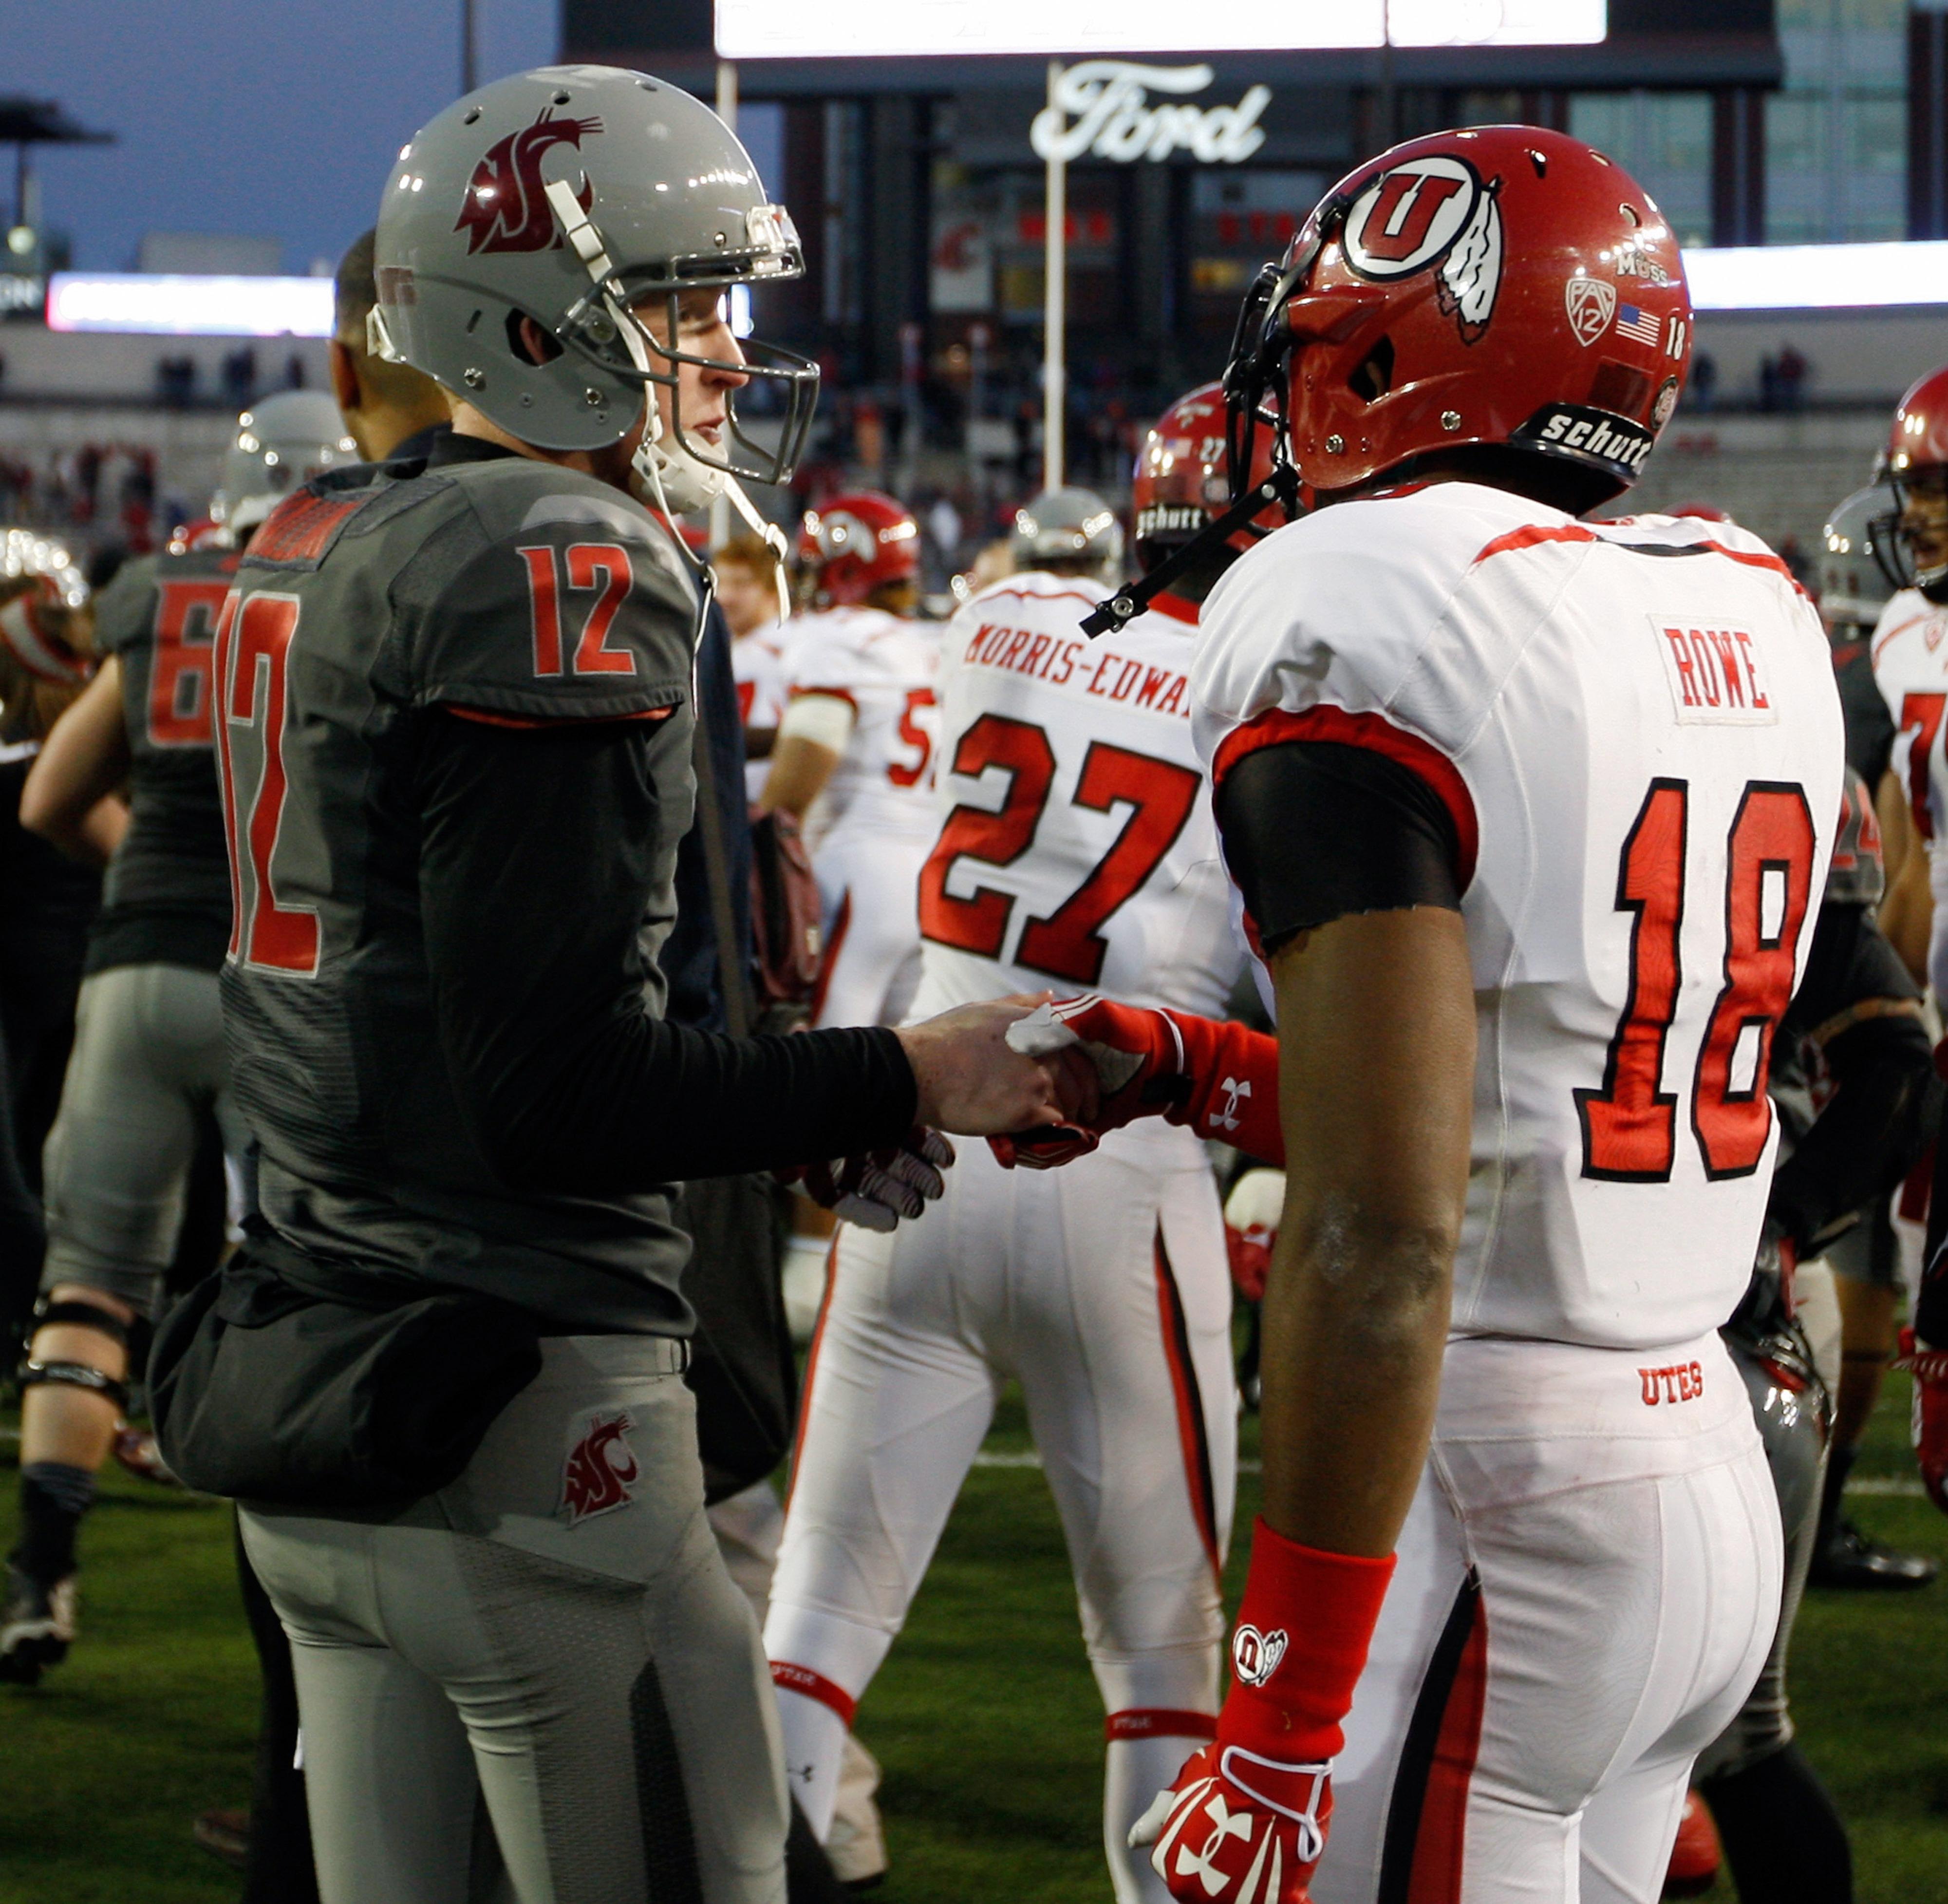 Utah looks to avenge last years loss in Pullman to Washington State.